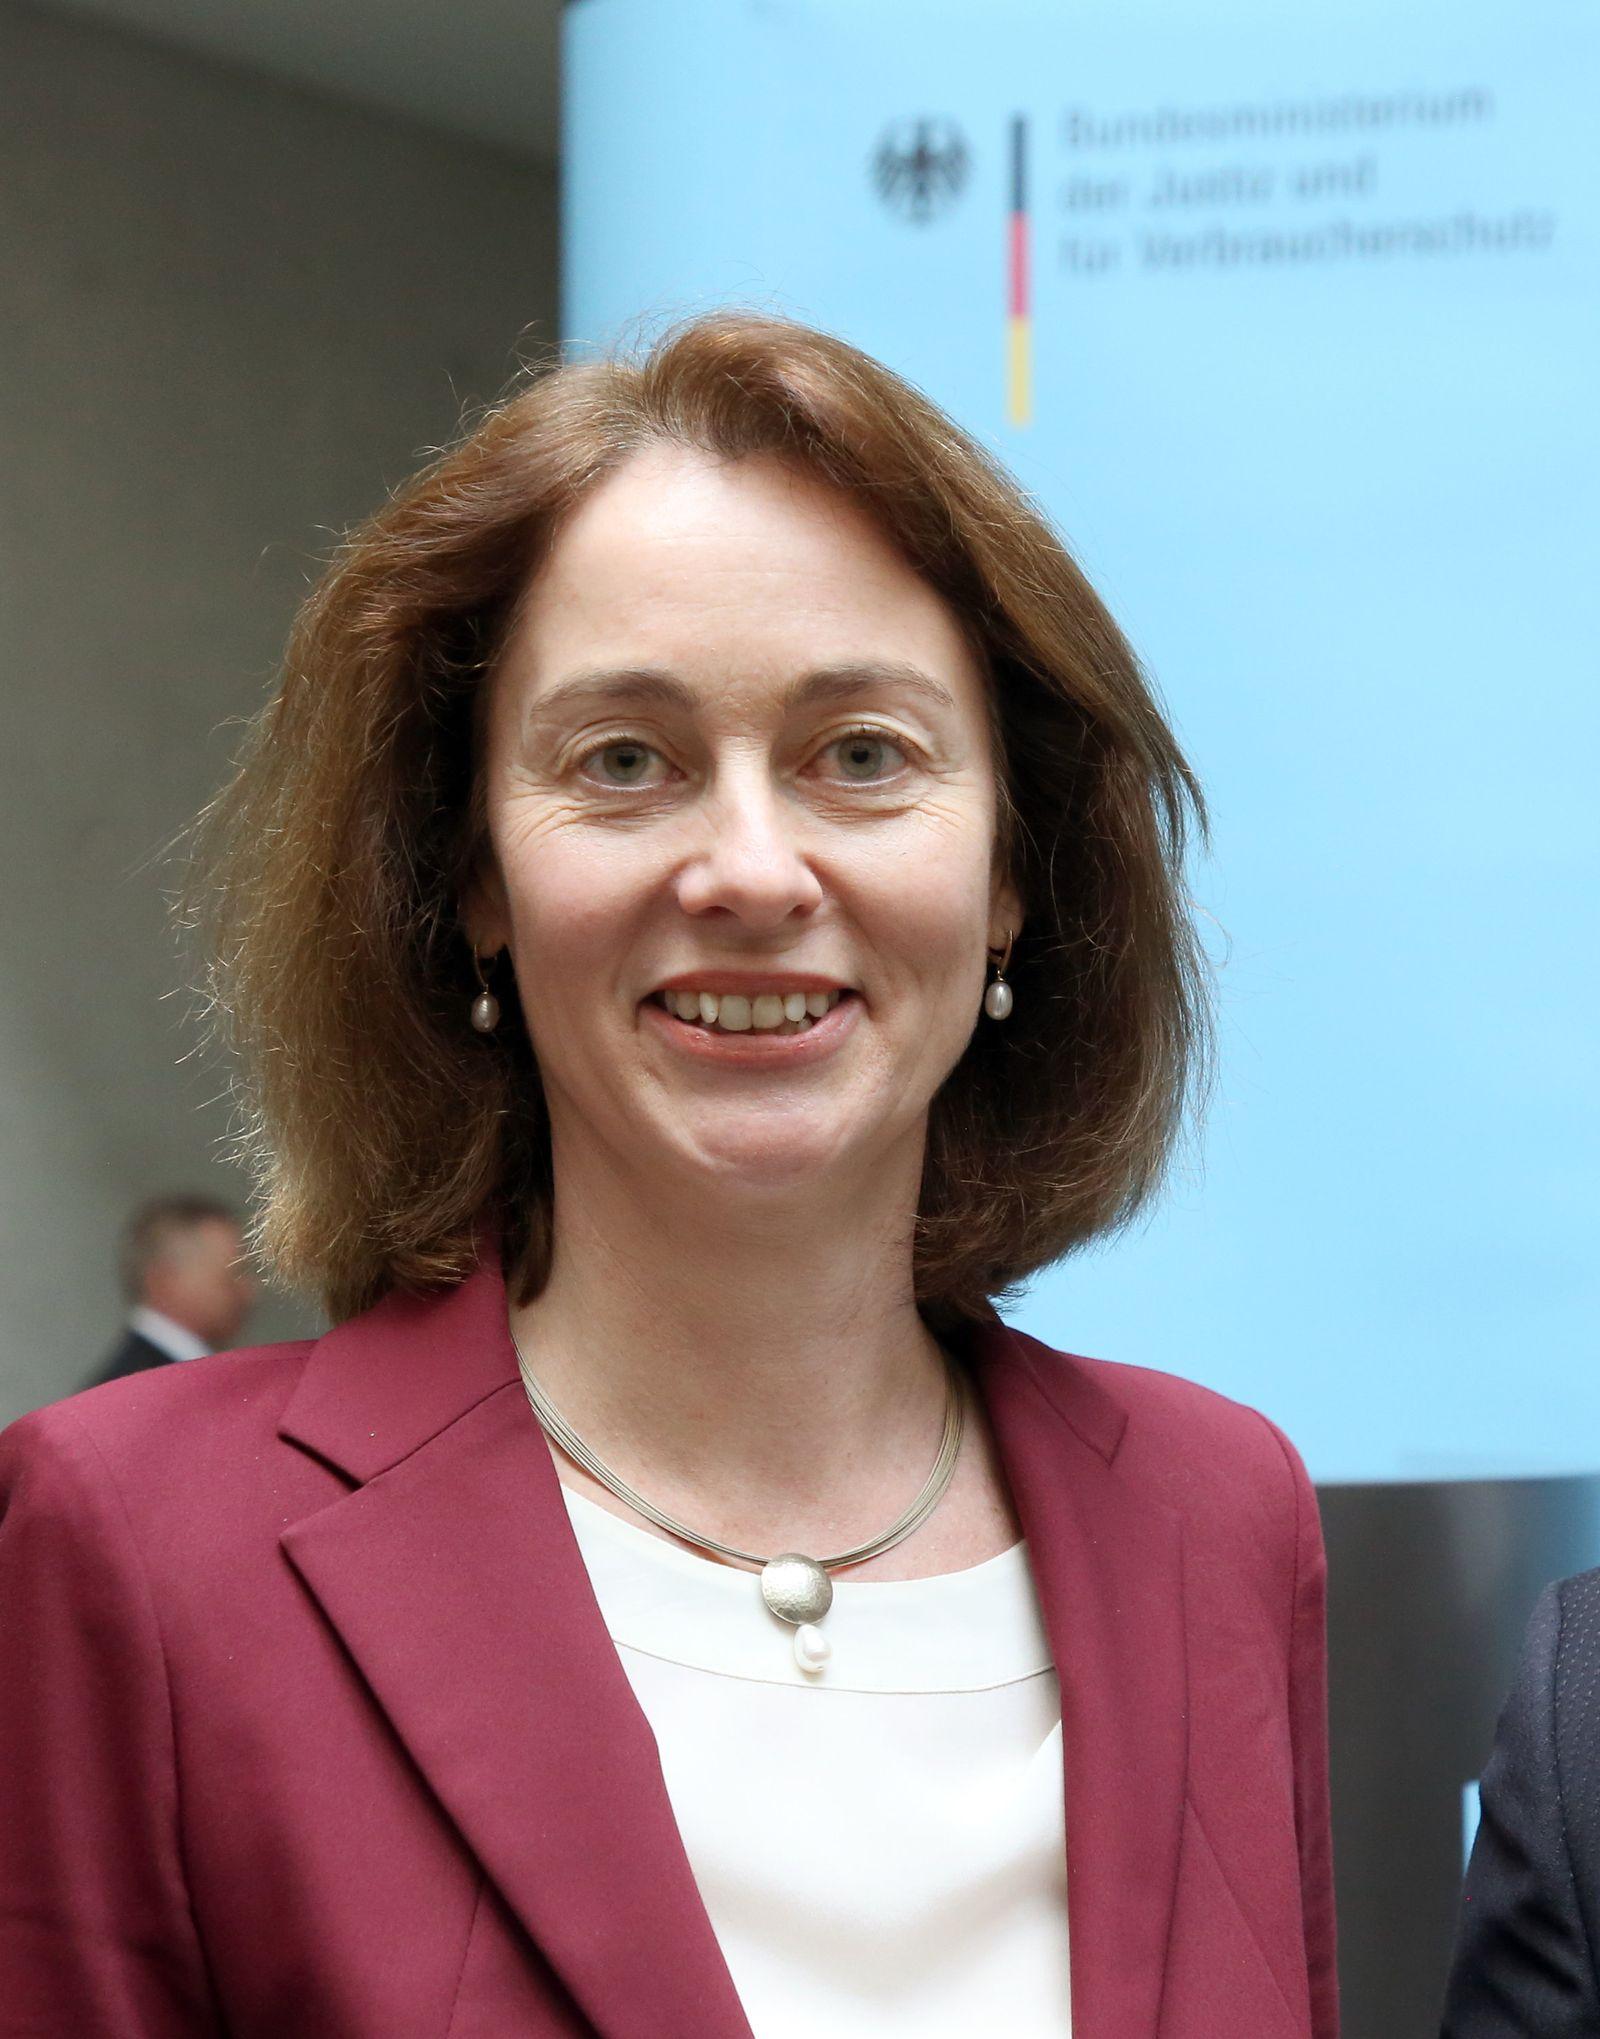 Amtsübergabe - Bundesjustizministerium